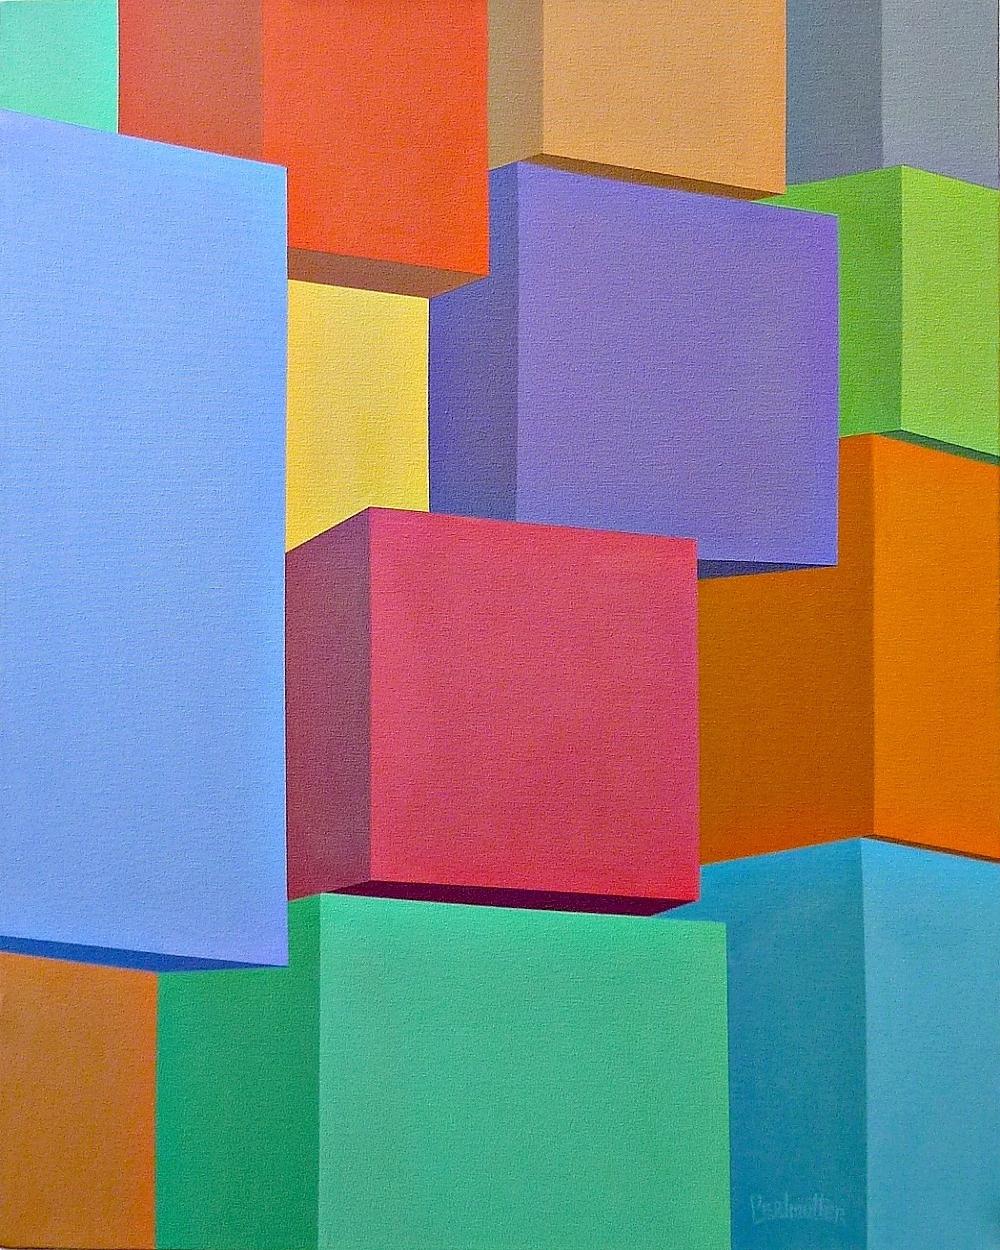 5+Wall+oF+Boxes.jpeg